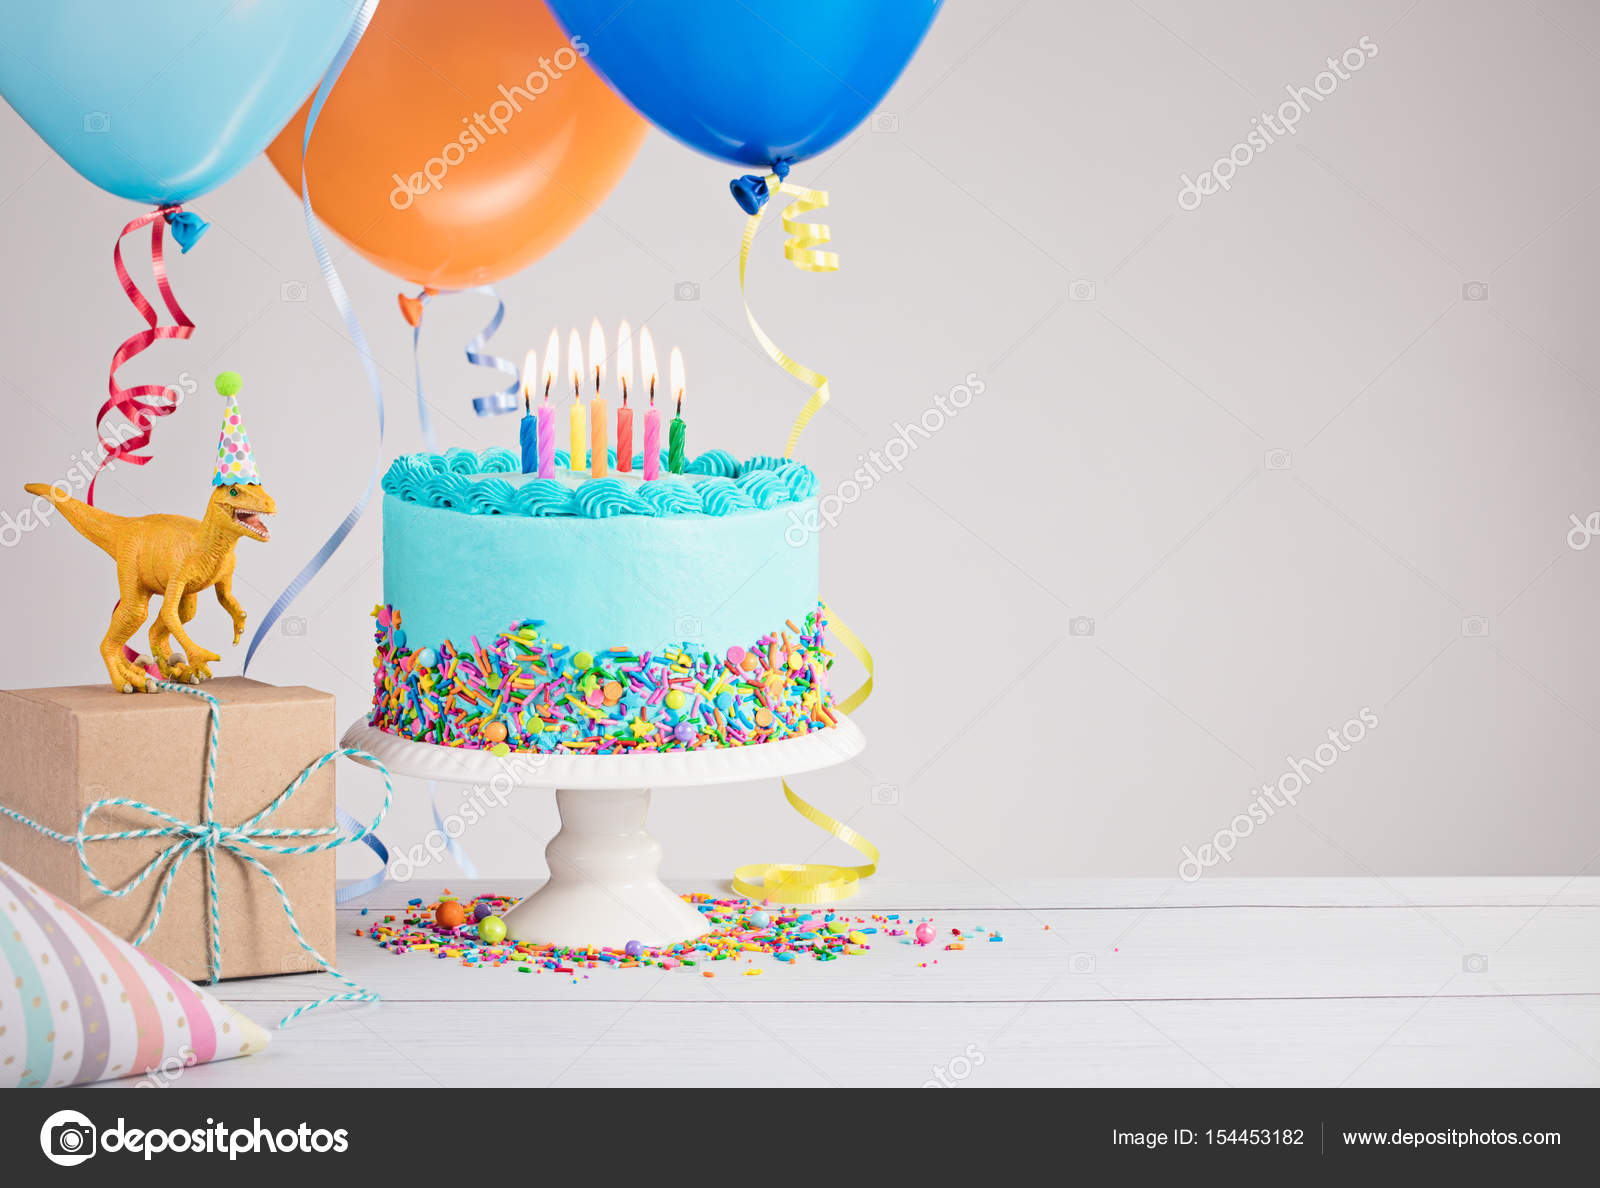 Blue Birthday Cake with Balloons Stock Photo juliannafunk 154453182